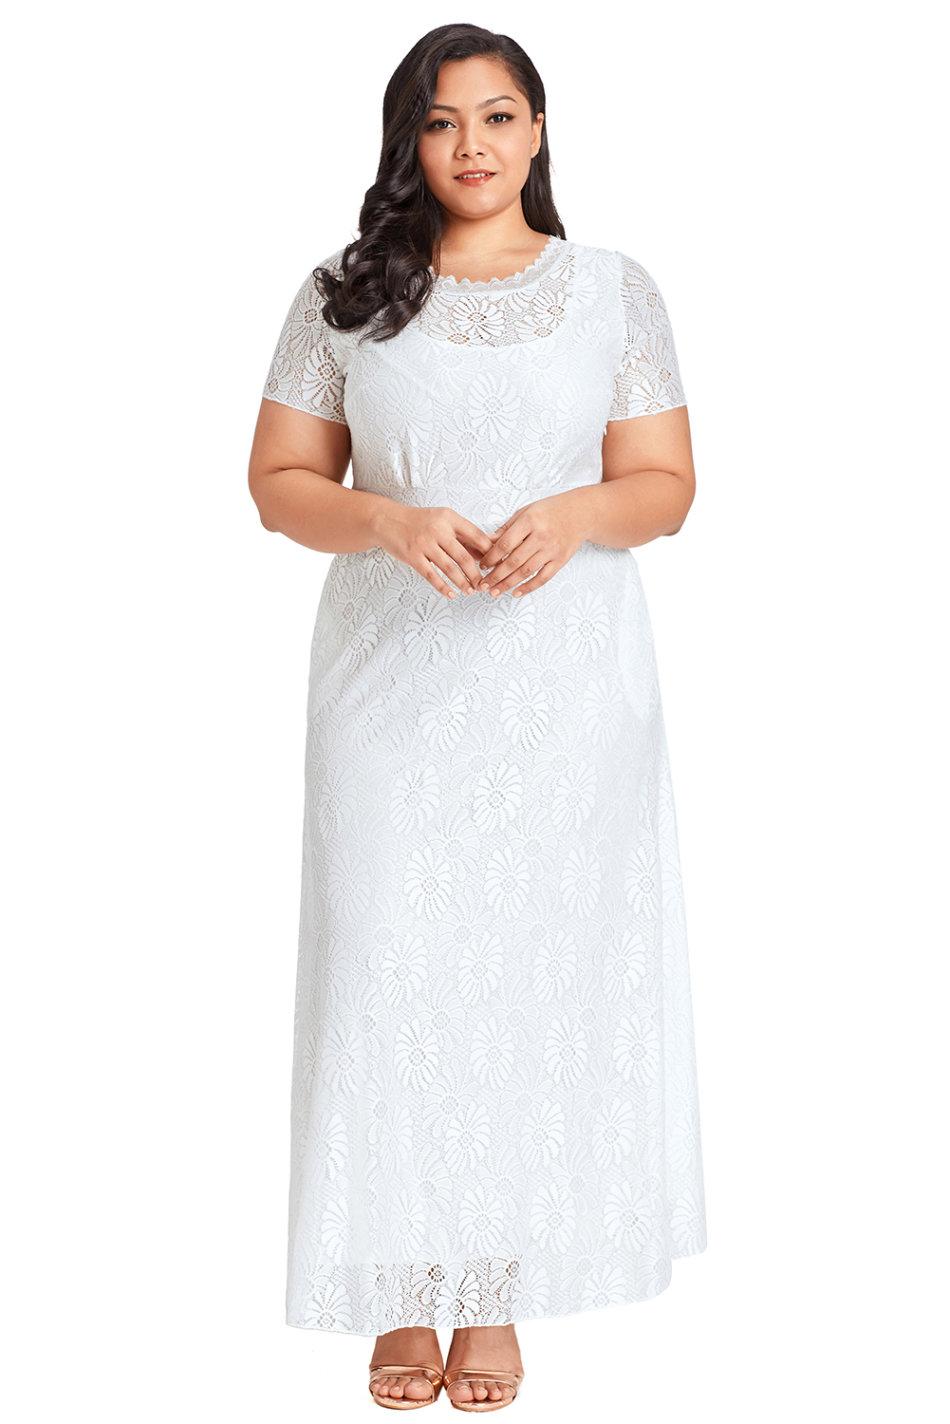 Plus Size Formal Dresses Used - raveitsafe